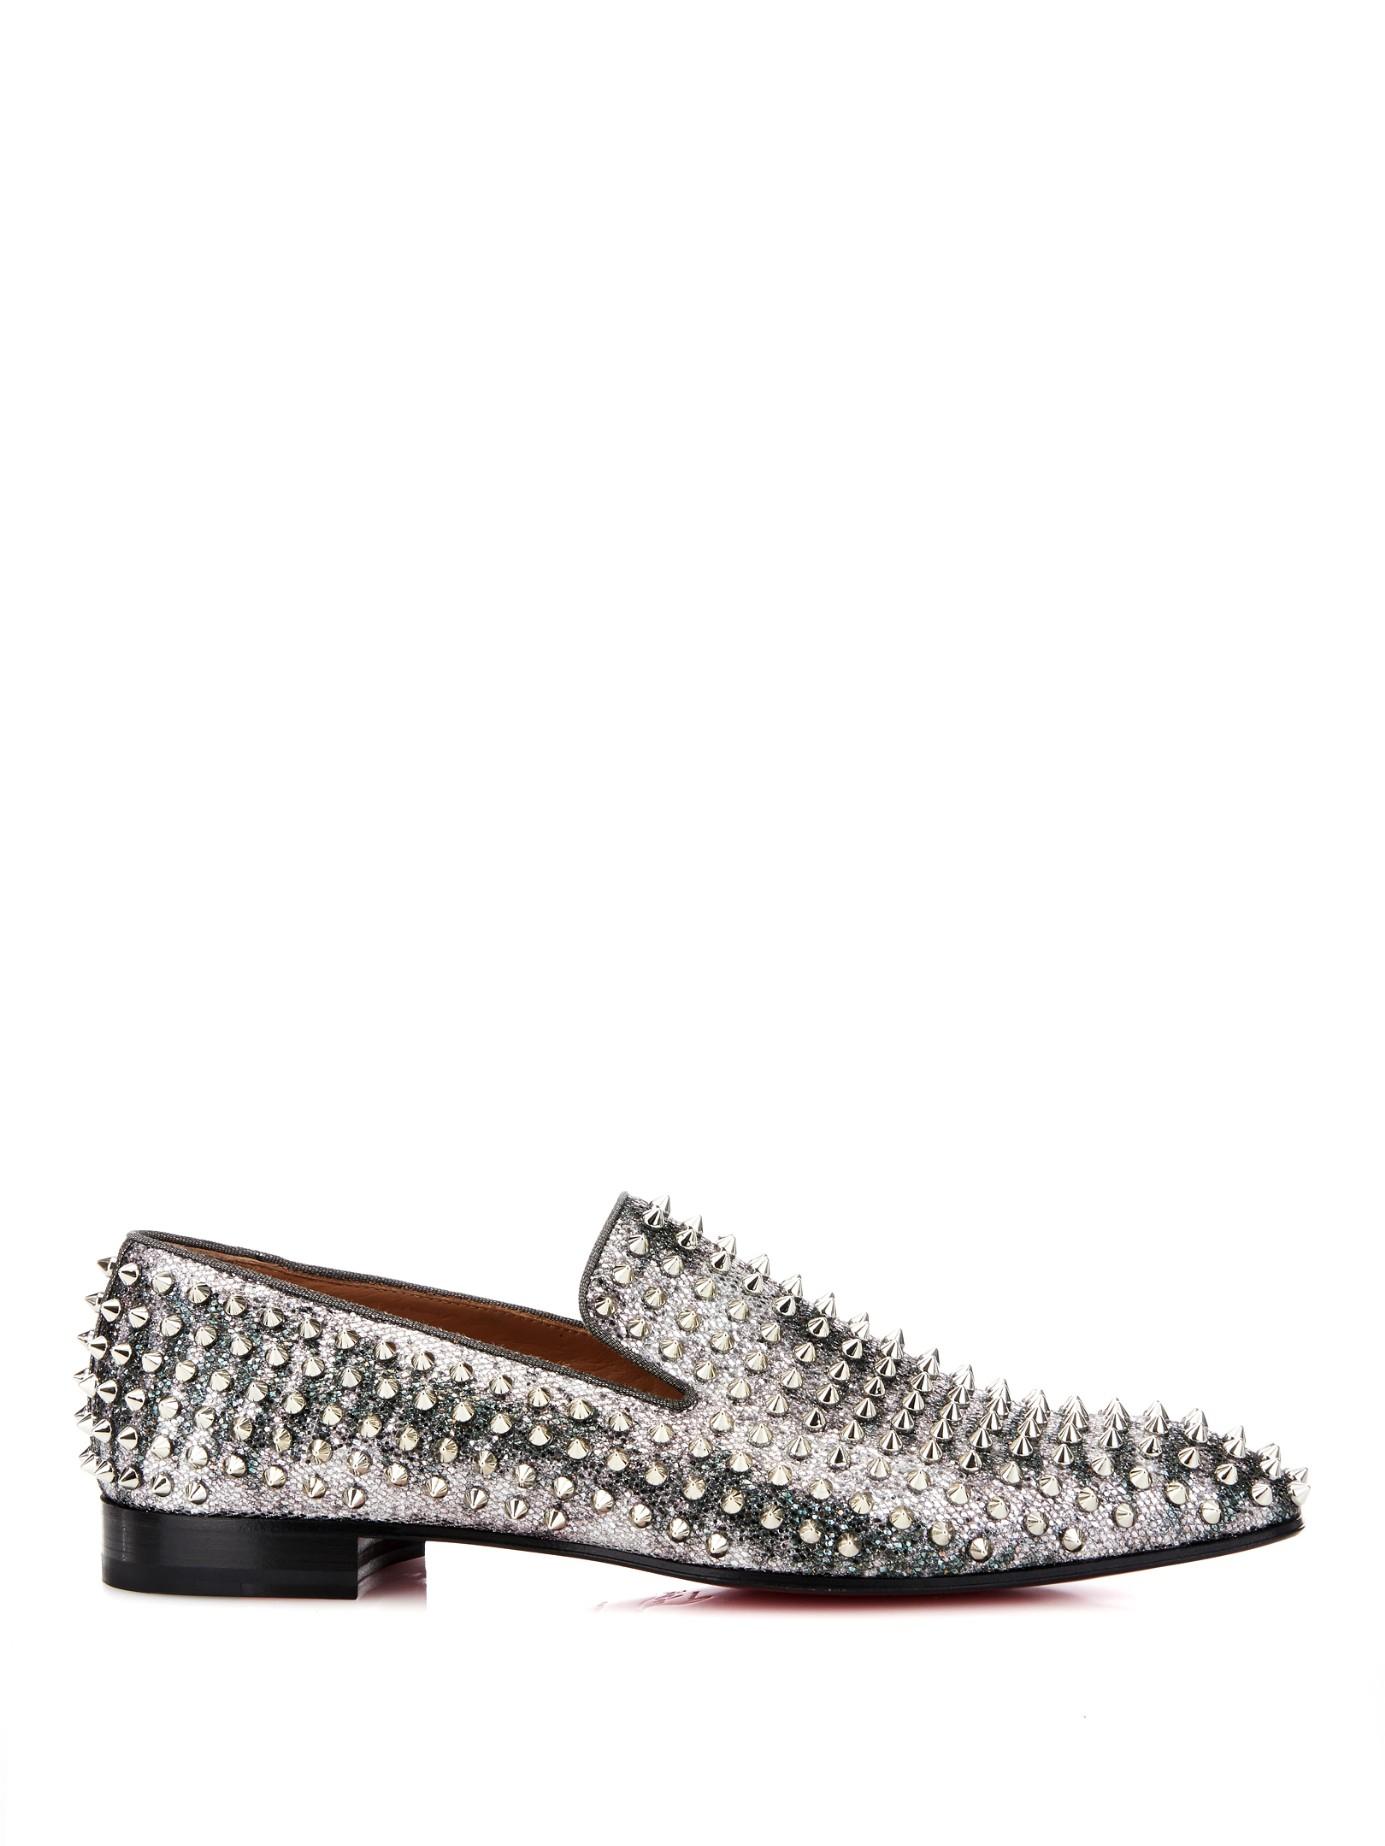 8d0b2859320 Lyst - Christian Louboutin Dandelion Studded Glitter Loafers in ...